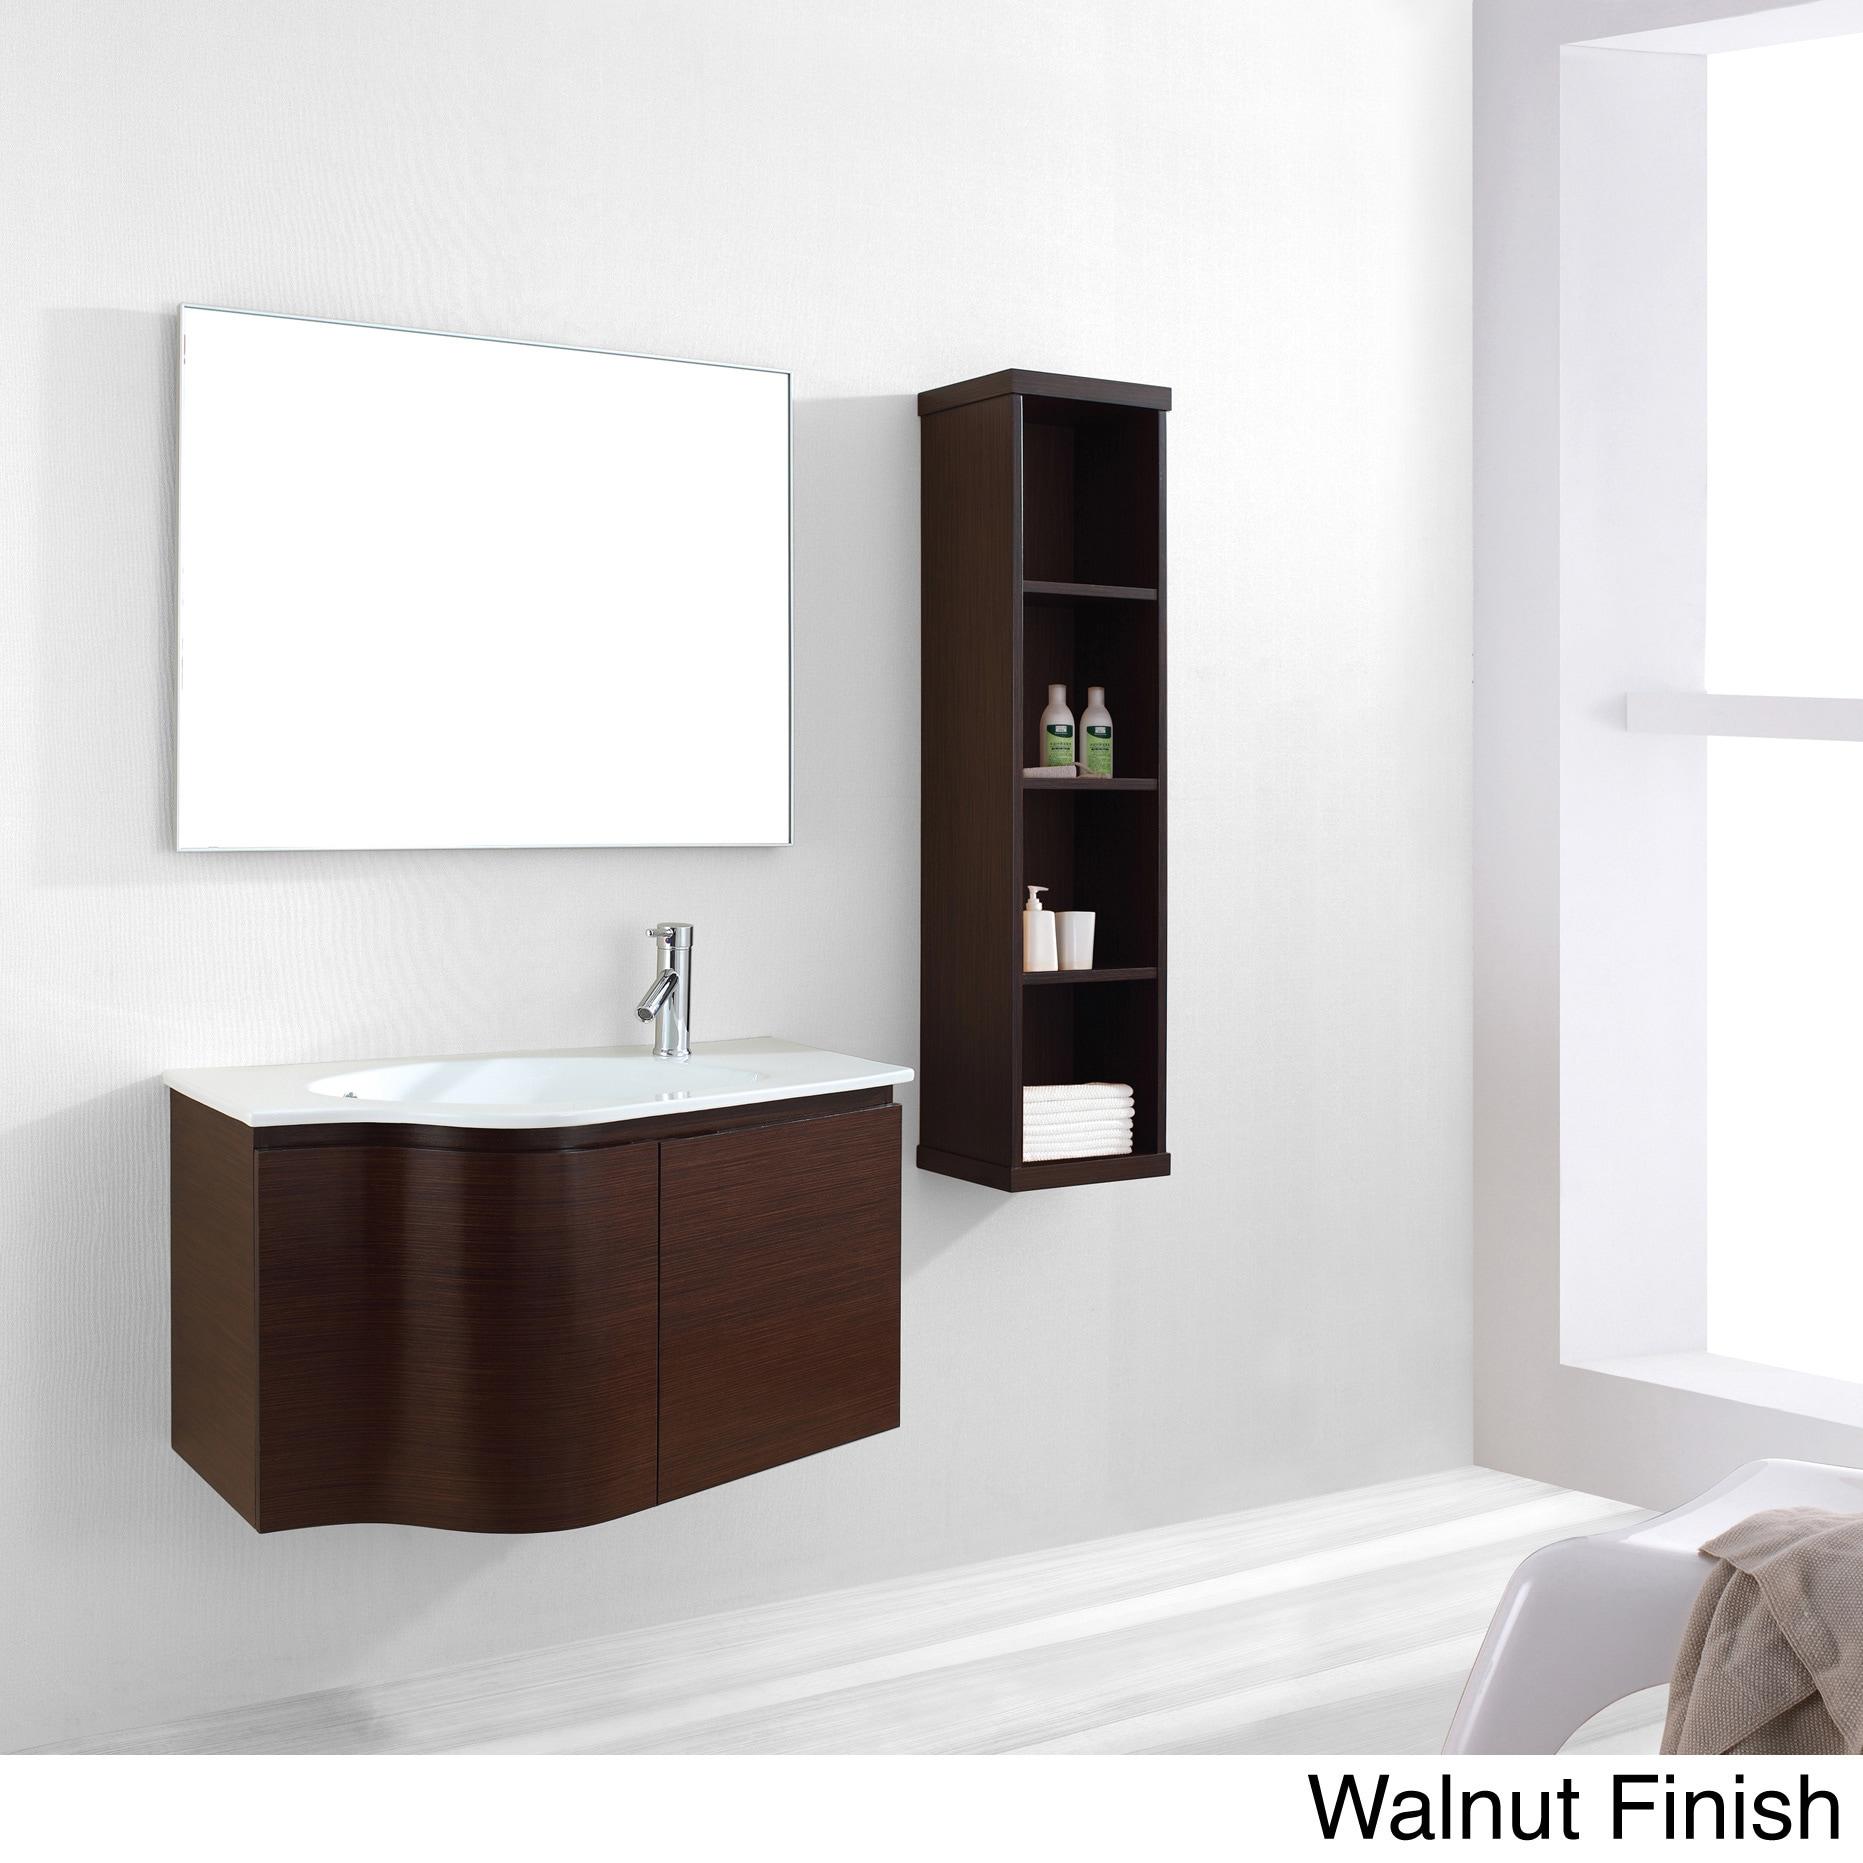 Shop Virtu USA Roselle 36-inch Single Sink Bathroom Vanity Set ... on english traditional bathrooms, construction bathrooms, old-fashioned white bathrooms, vintage bathrooms, christmas bathrooms, spa-style bathrooms, english wallpaper for bathrooms, black painted bathrooms, john saladino bathrooms, english bathroom ideas,